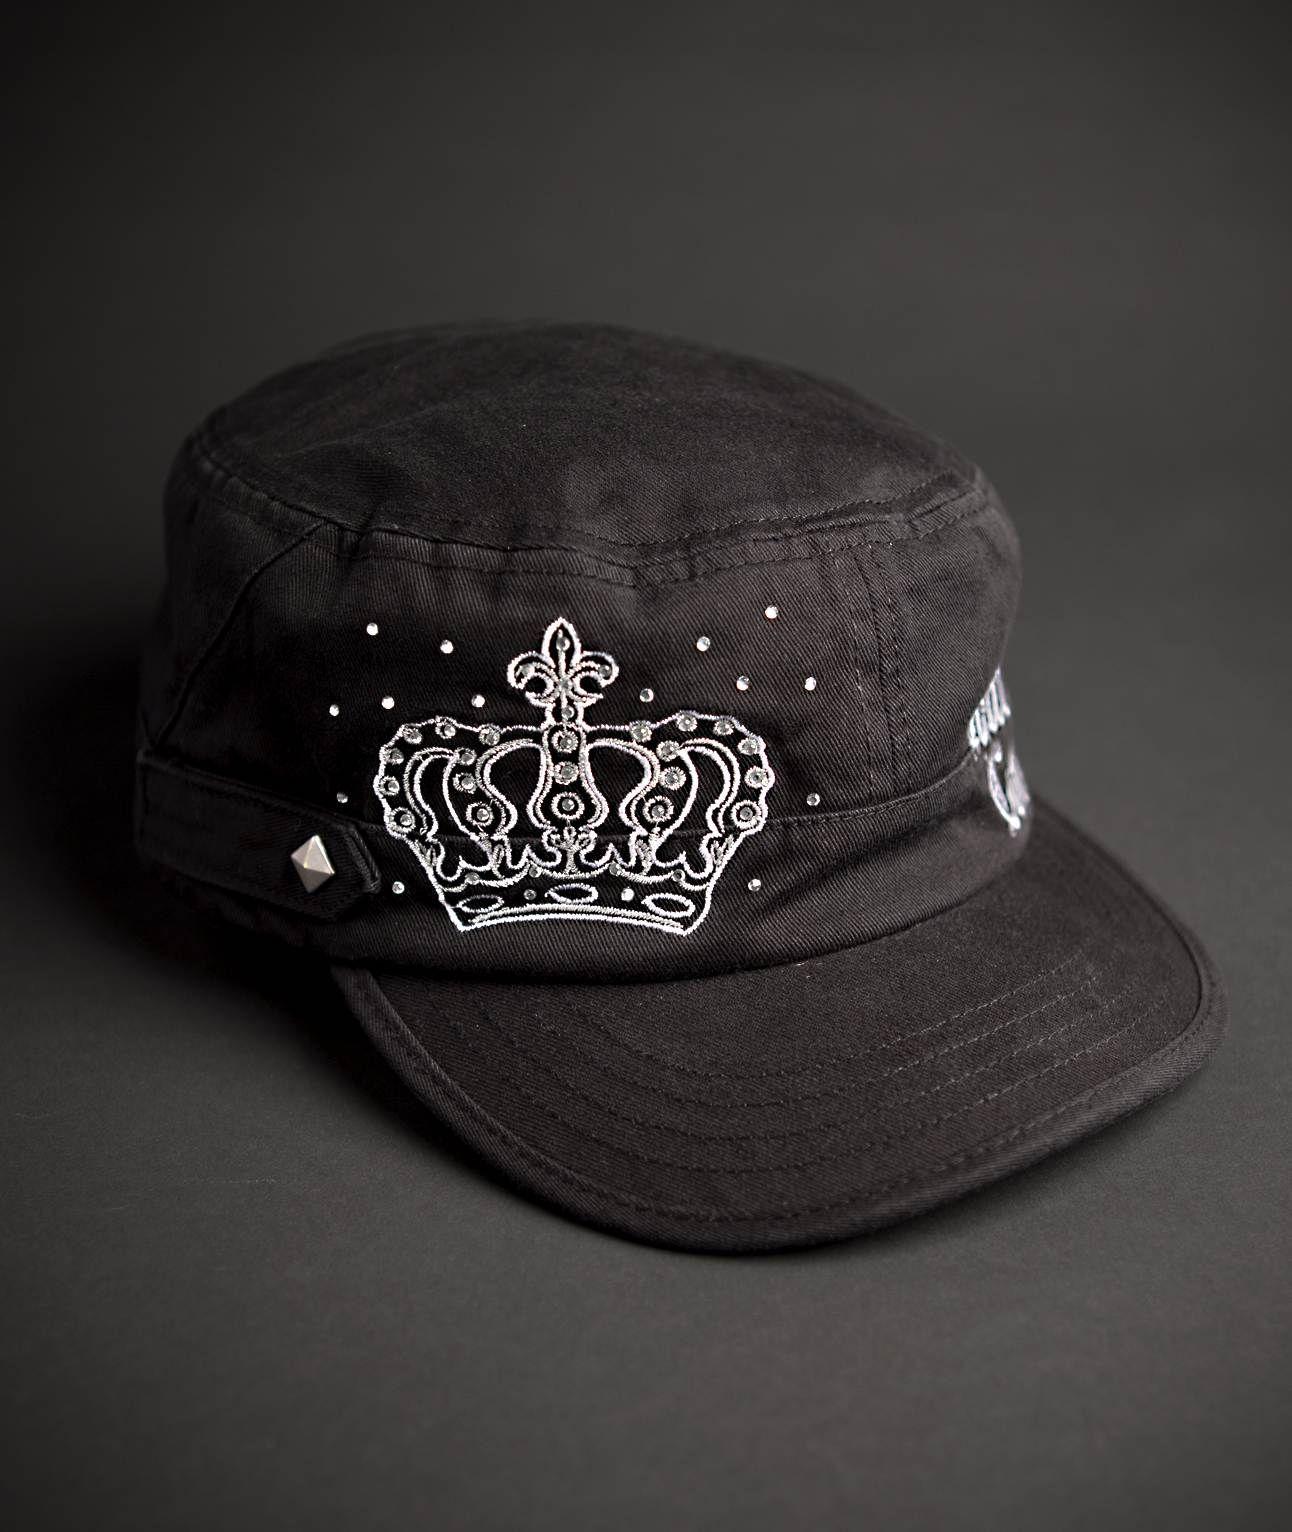 Hard rock cafe couture cadet hat in white cadet hat